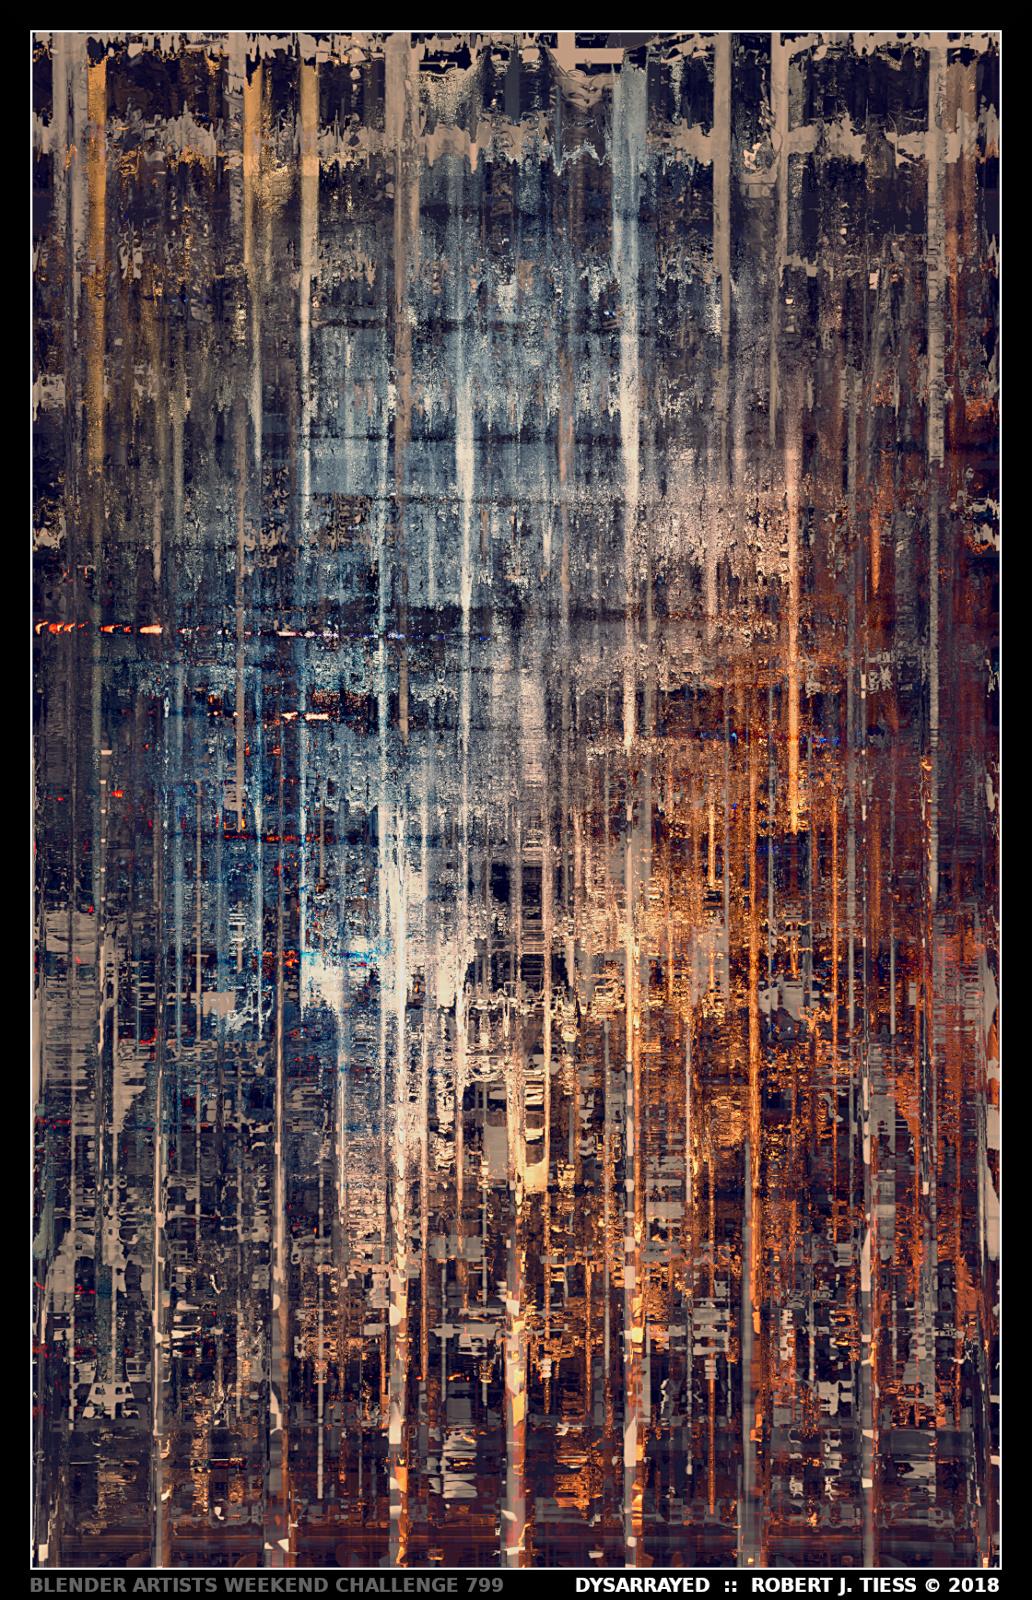 Dysarrayed - By Robert J. Tiess